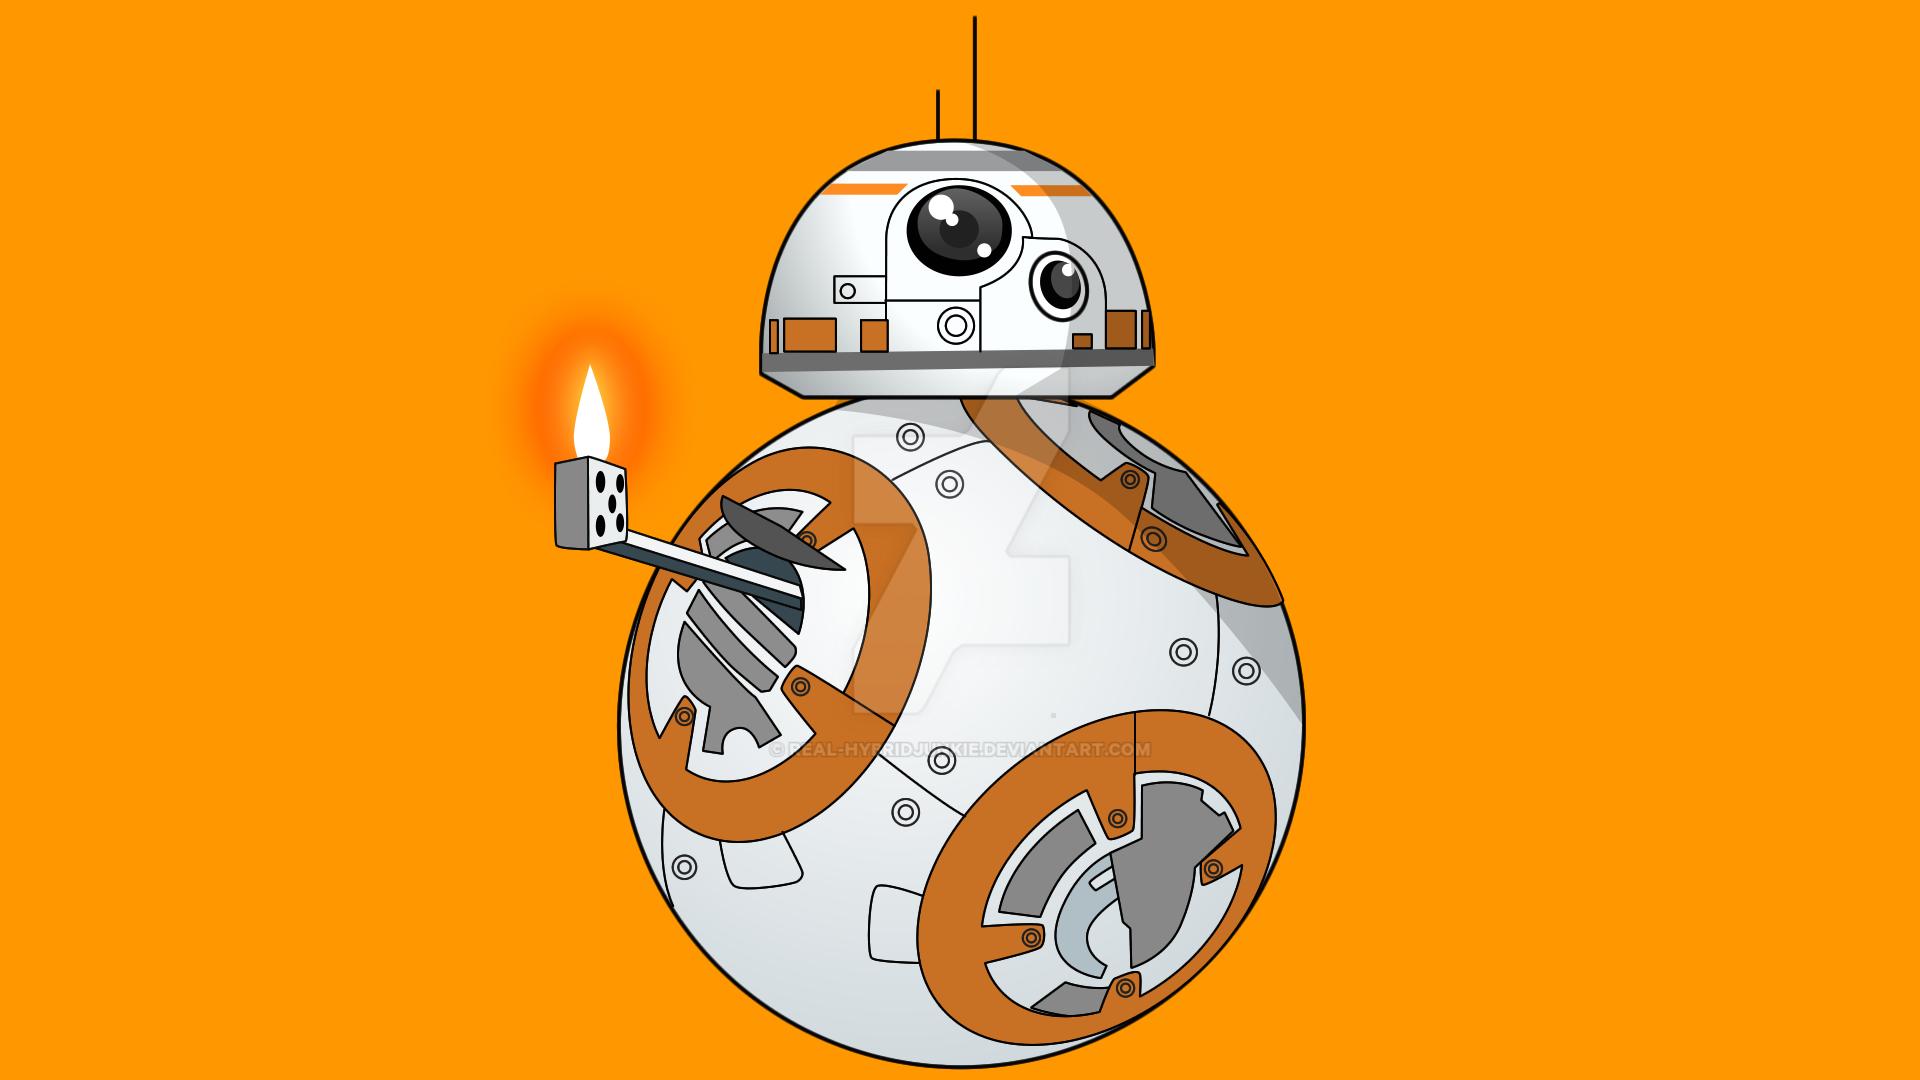 star wars the force awakens wallpapers reddit